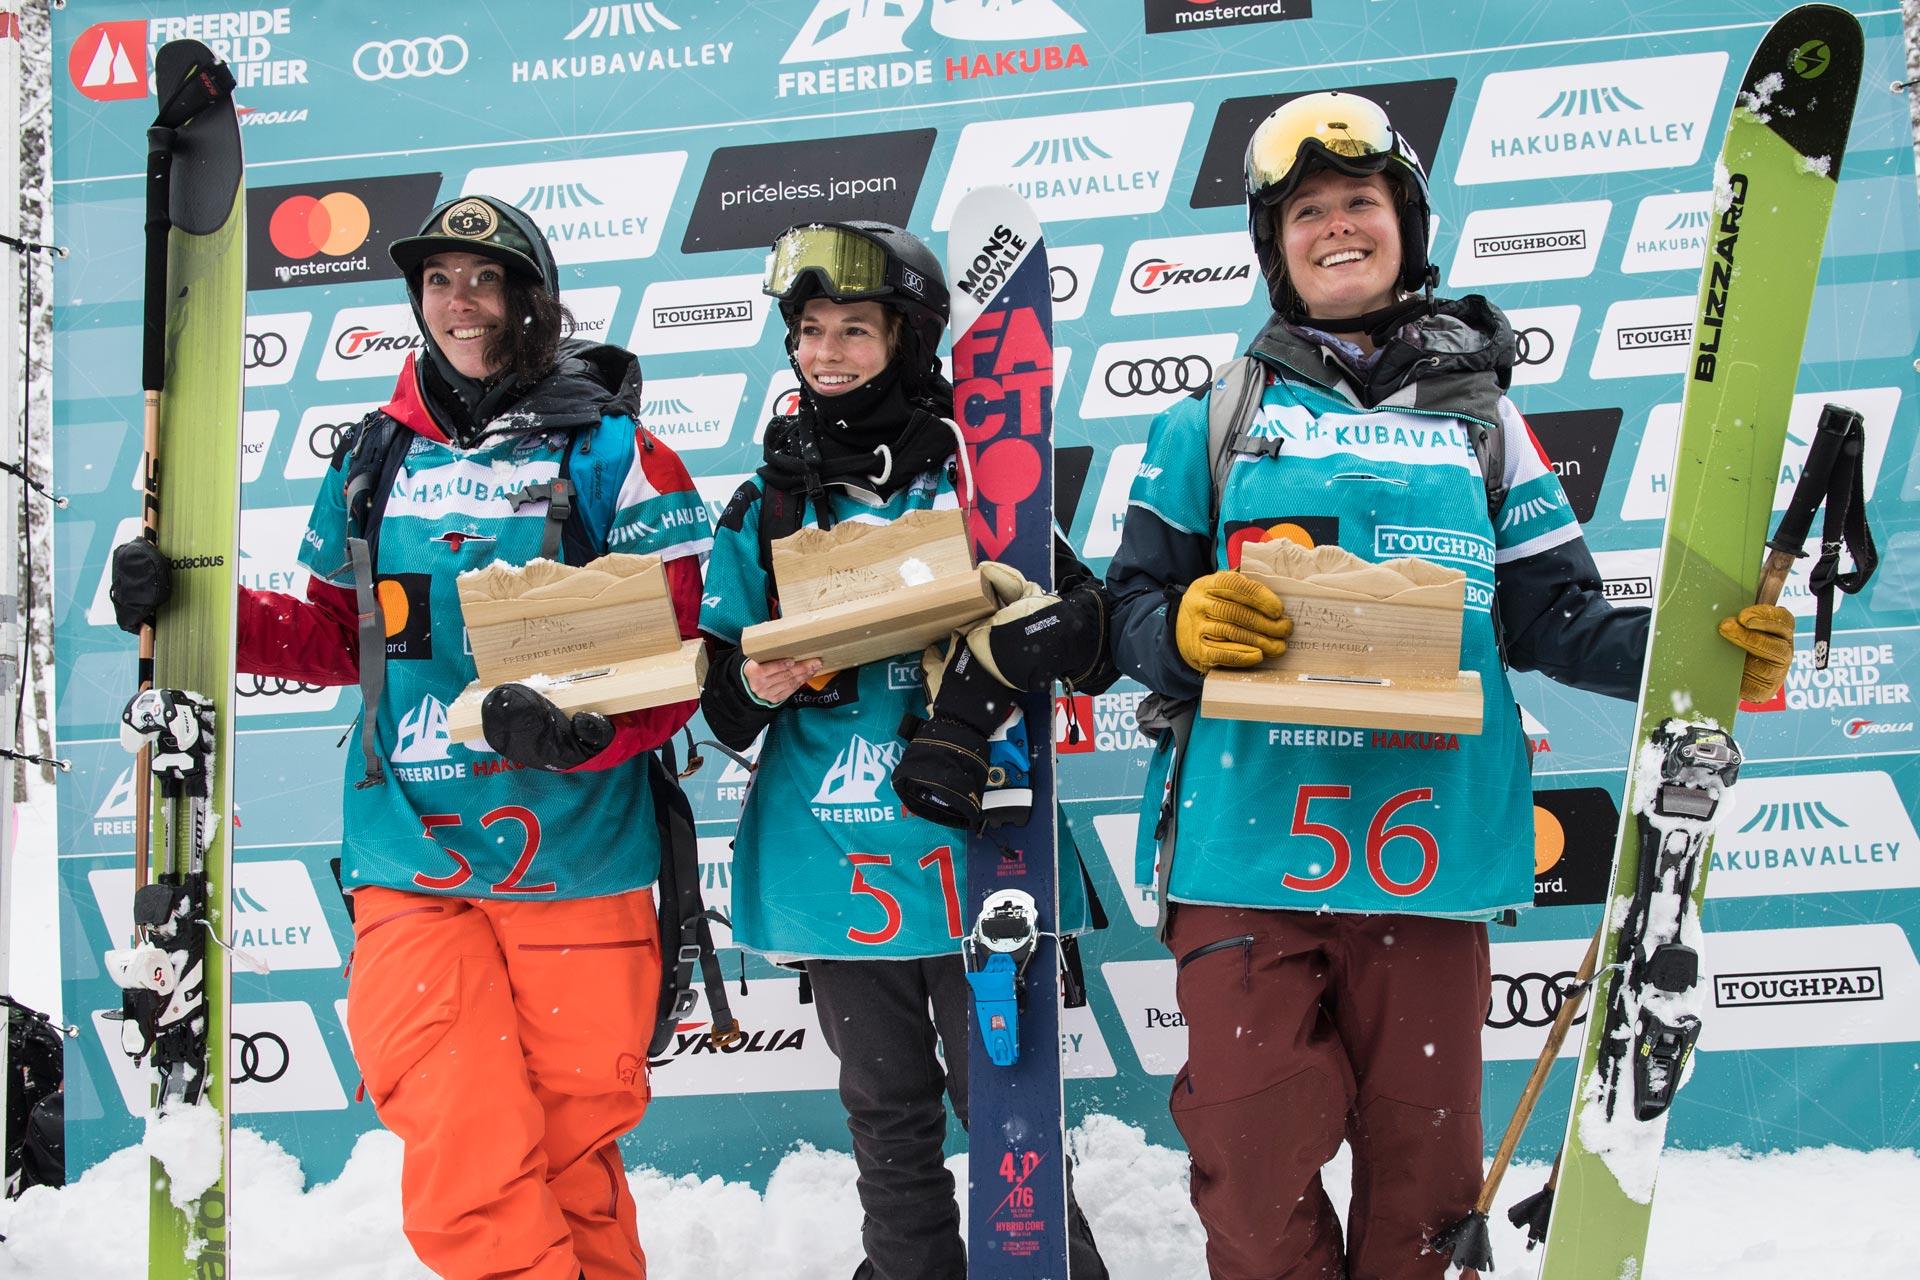 Top 3 Ladies: Caite Zeliff (USA) , Elisabeth Gerritzen (SUI), Jaclyn Paaso (USA) (v.l.n.r.) - Foto: freerideworldtour.com / J. Halayko